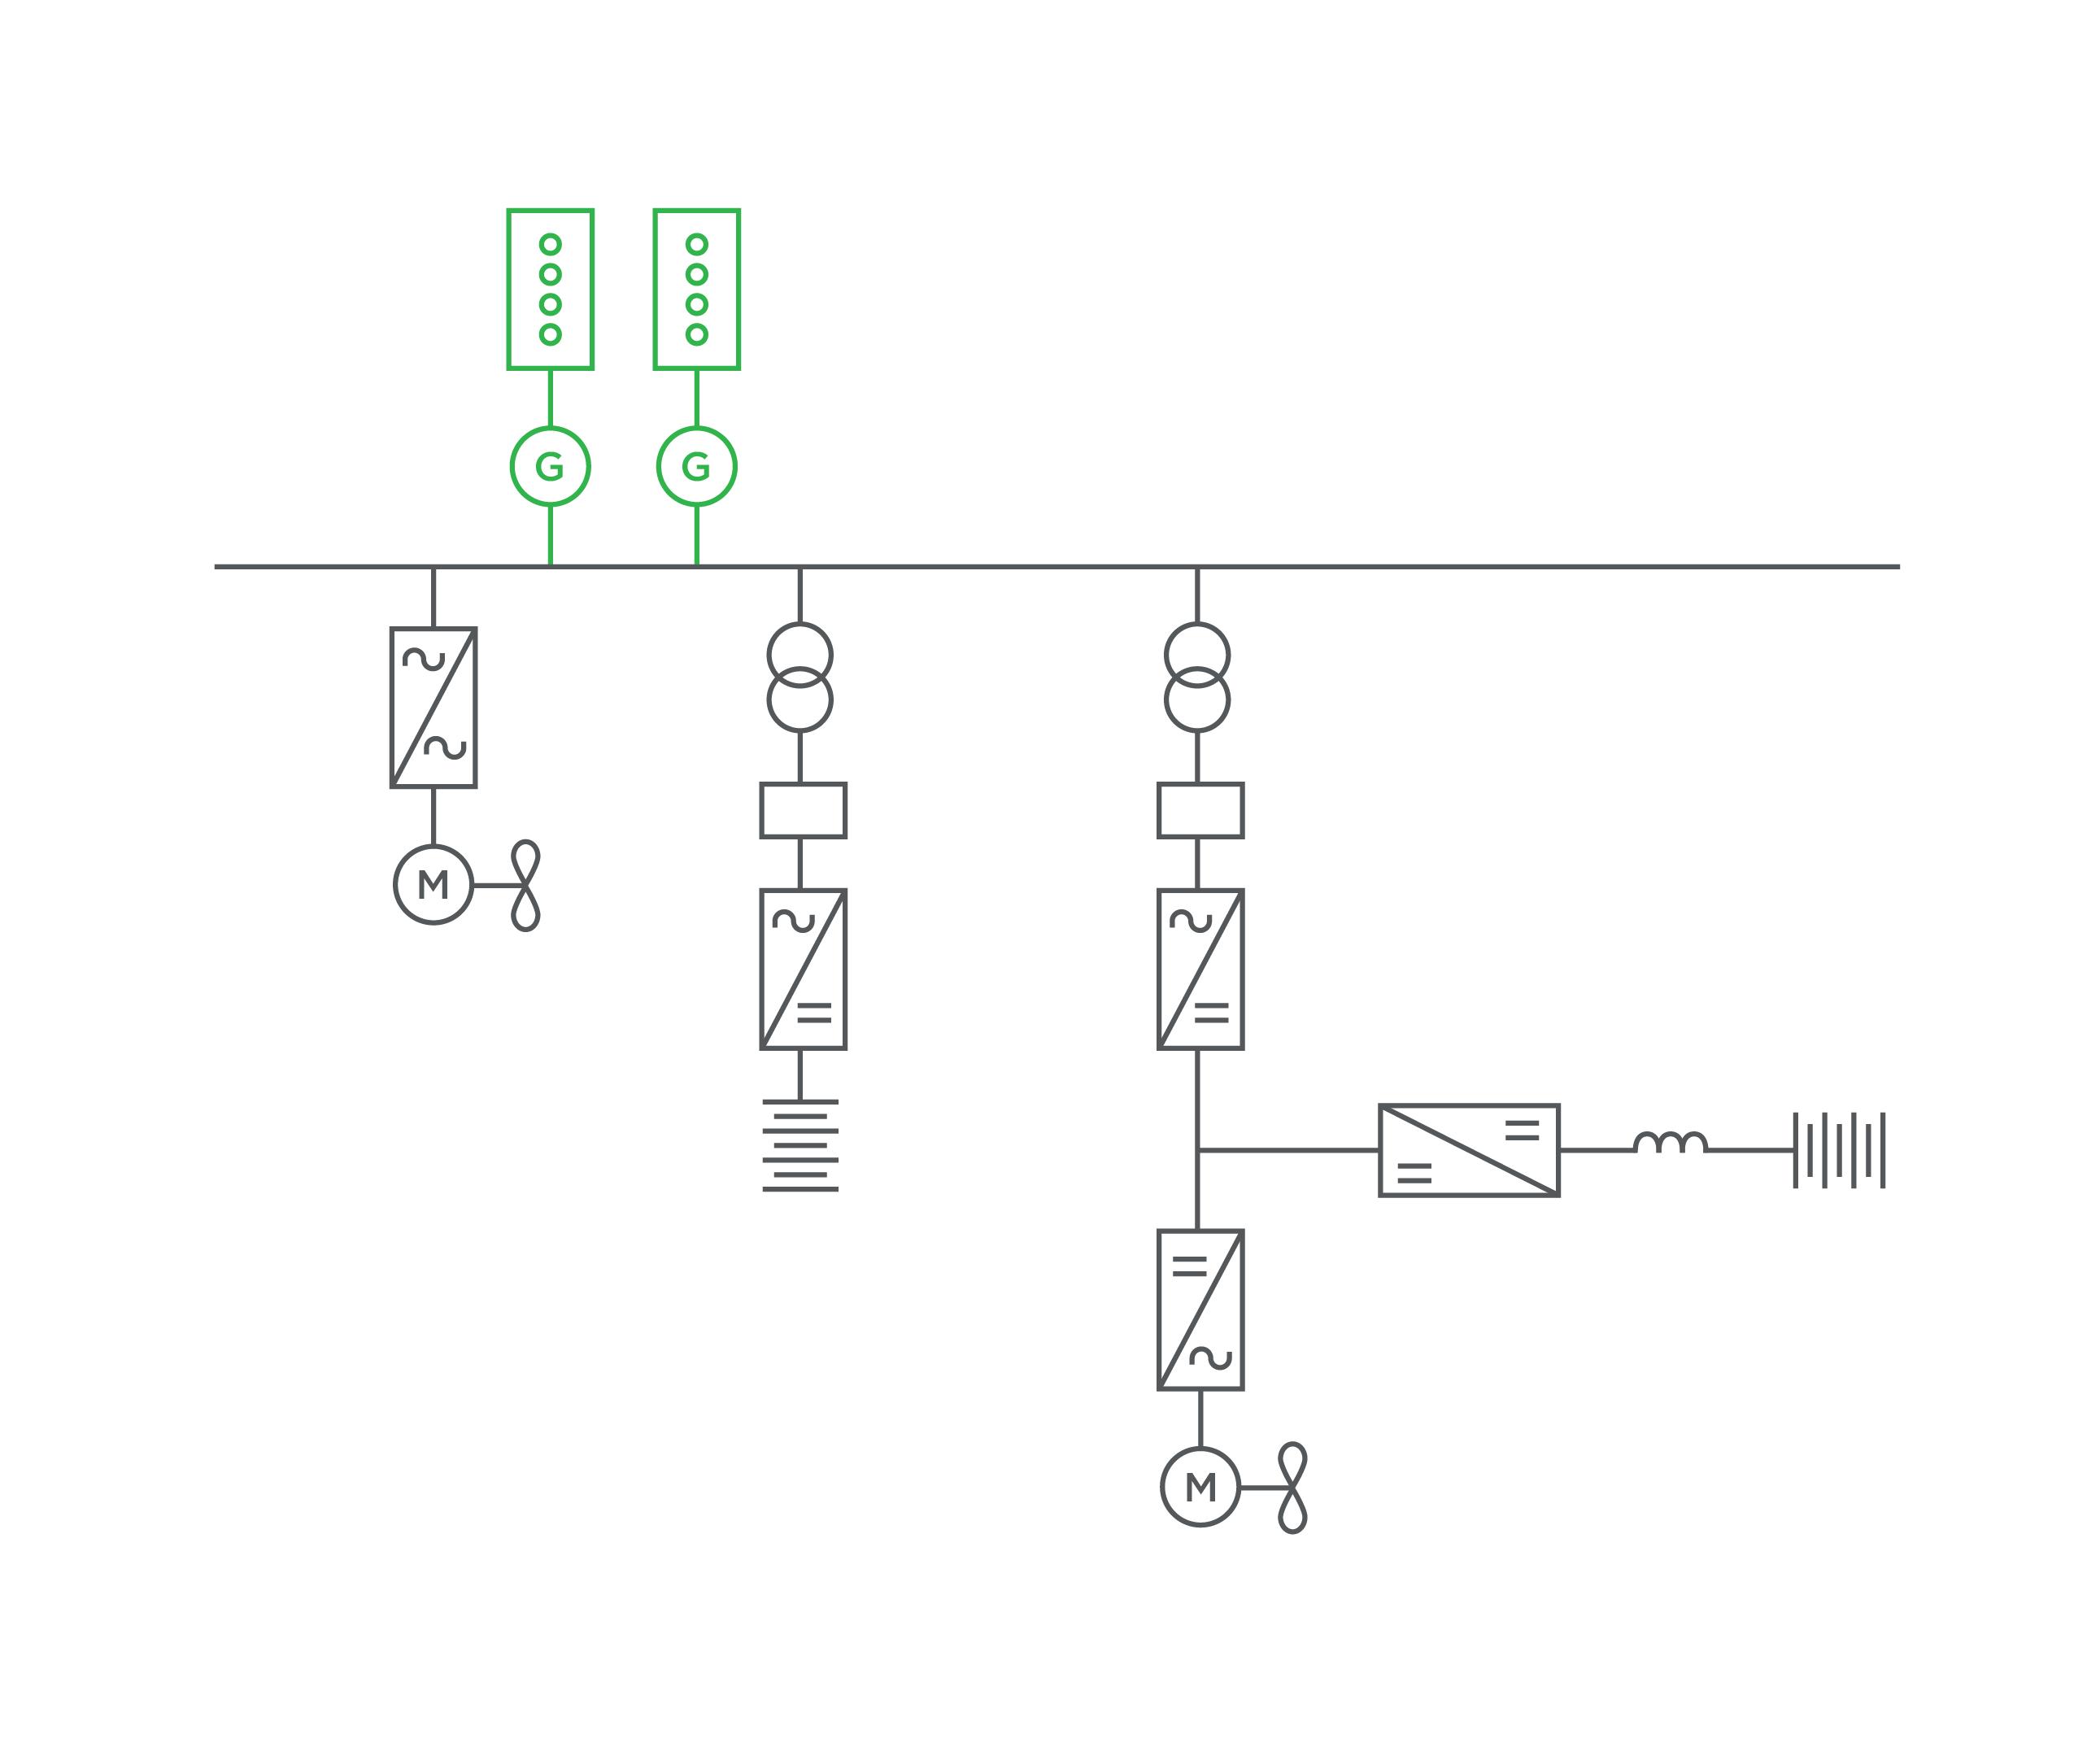 spoc-grid-inverter-technology-marine-application